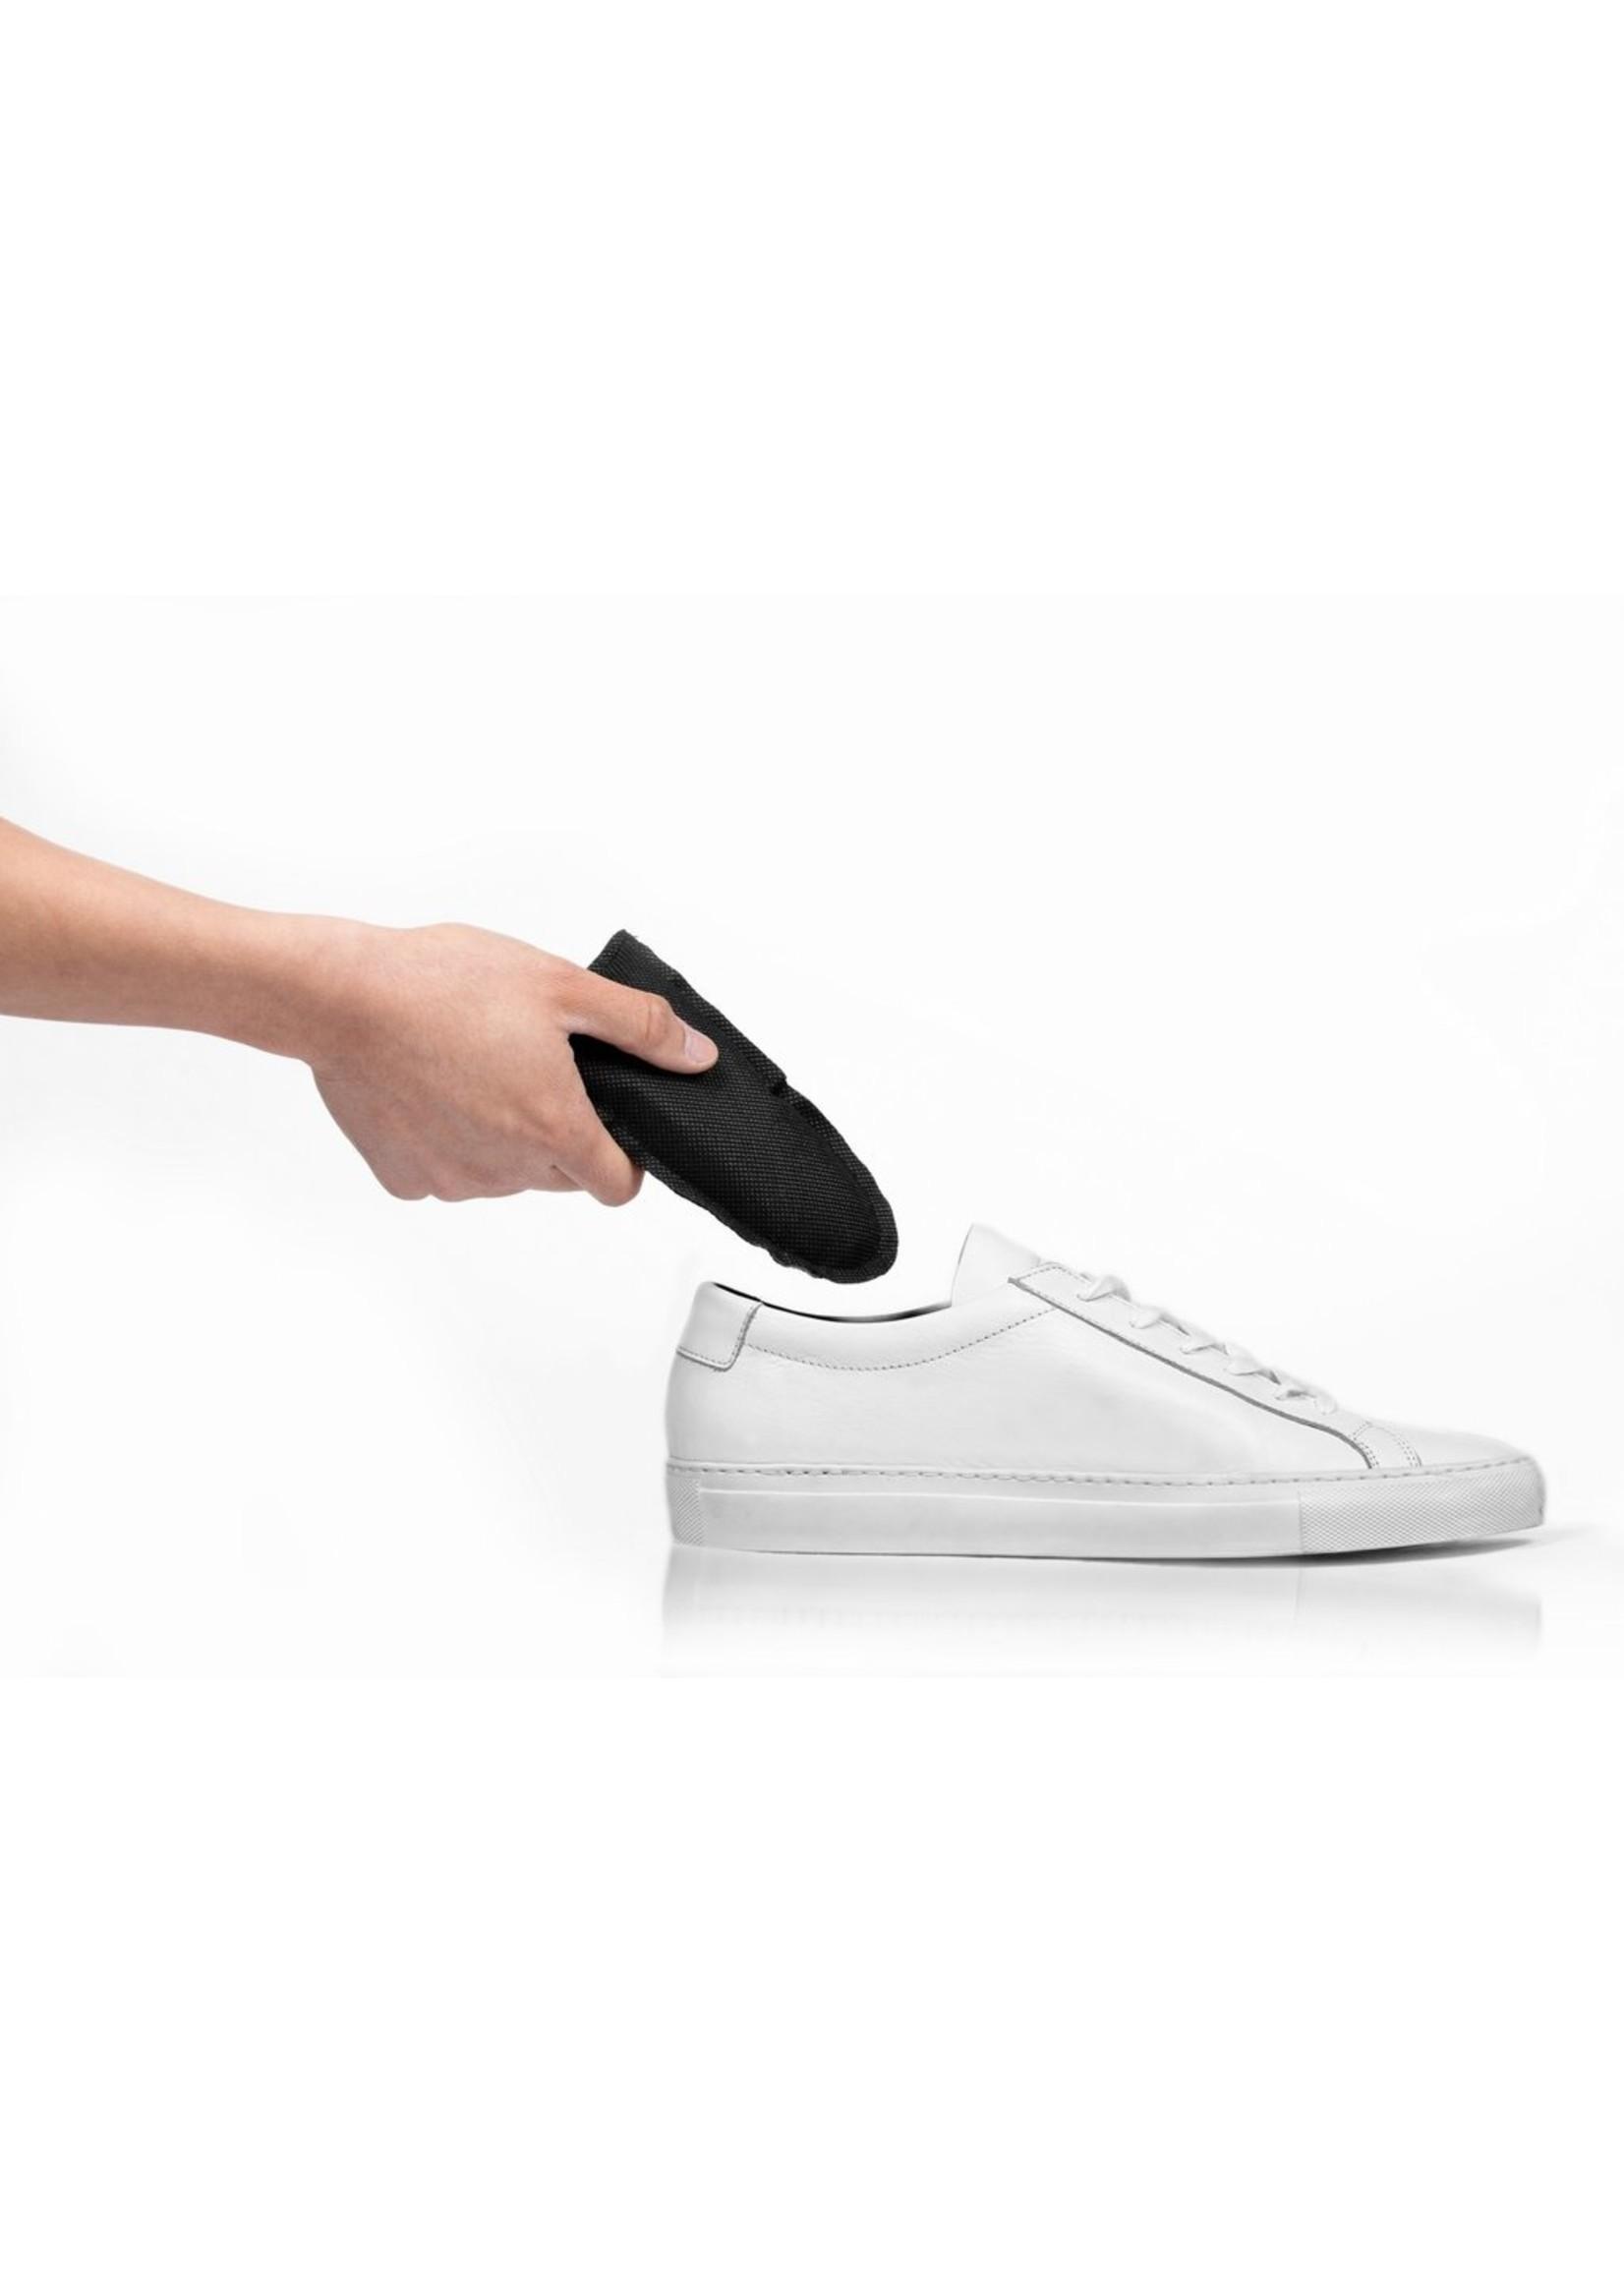 Ever Bamboo Shoe Deodorizer (Pair)